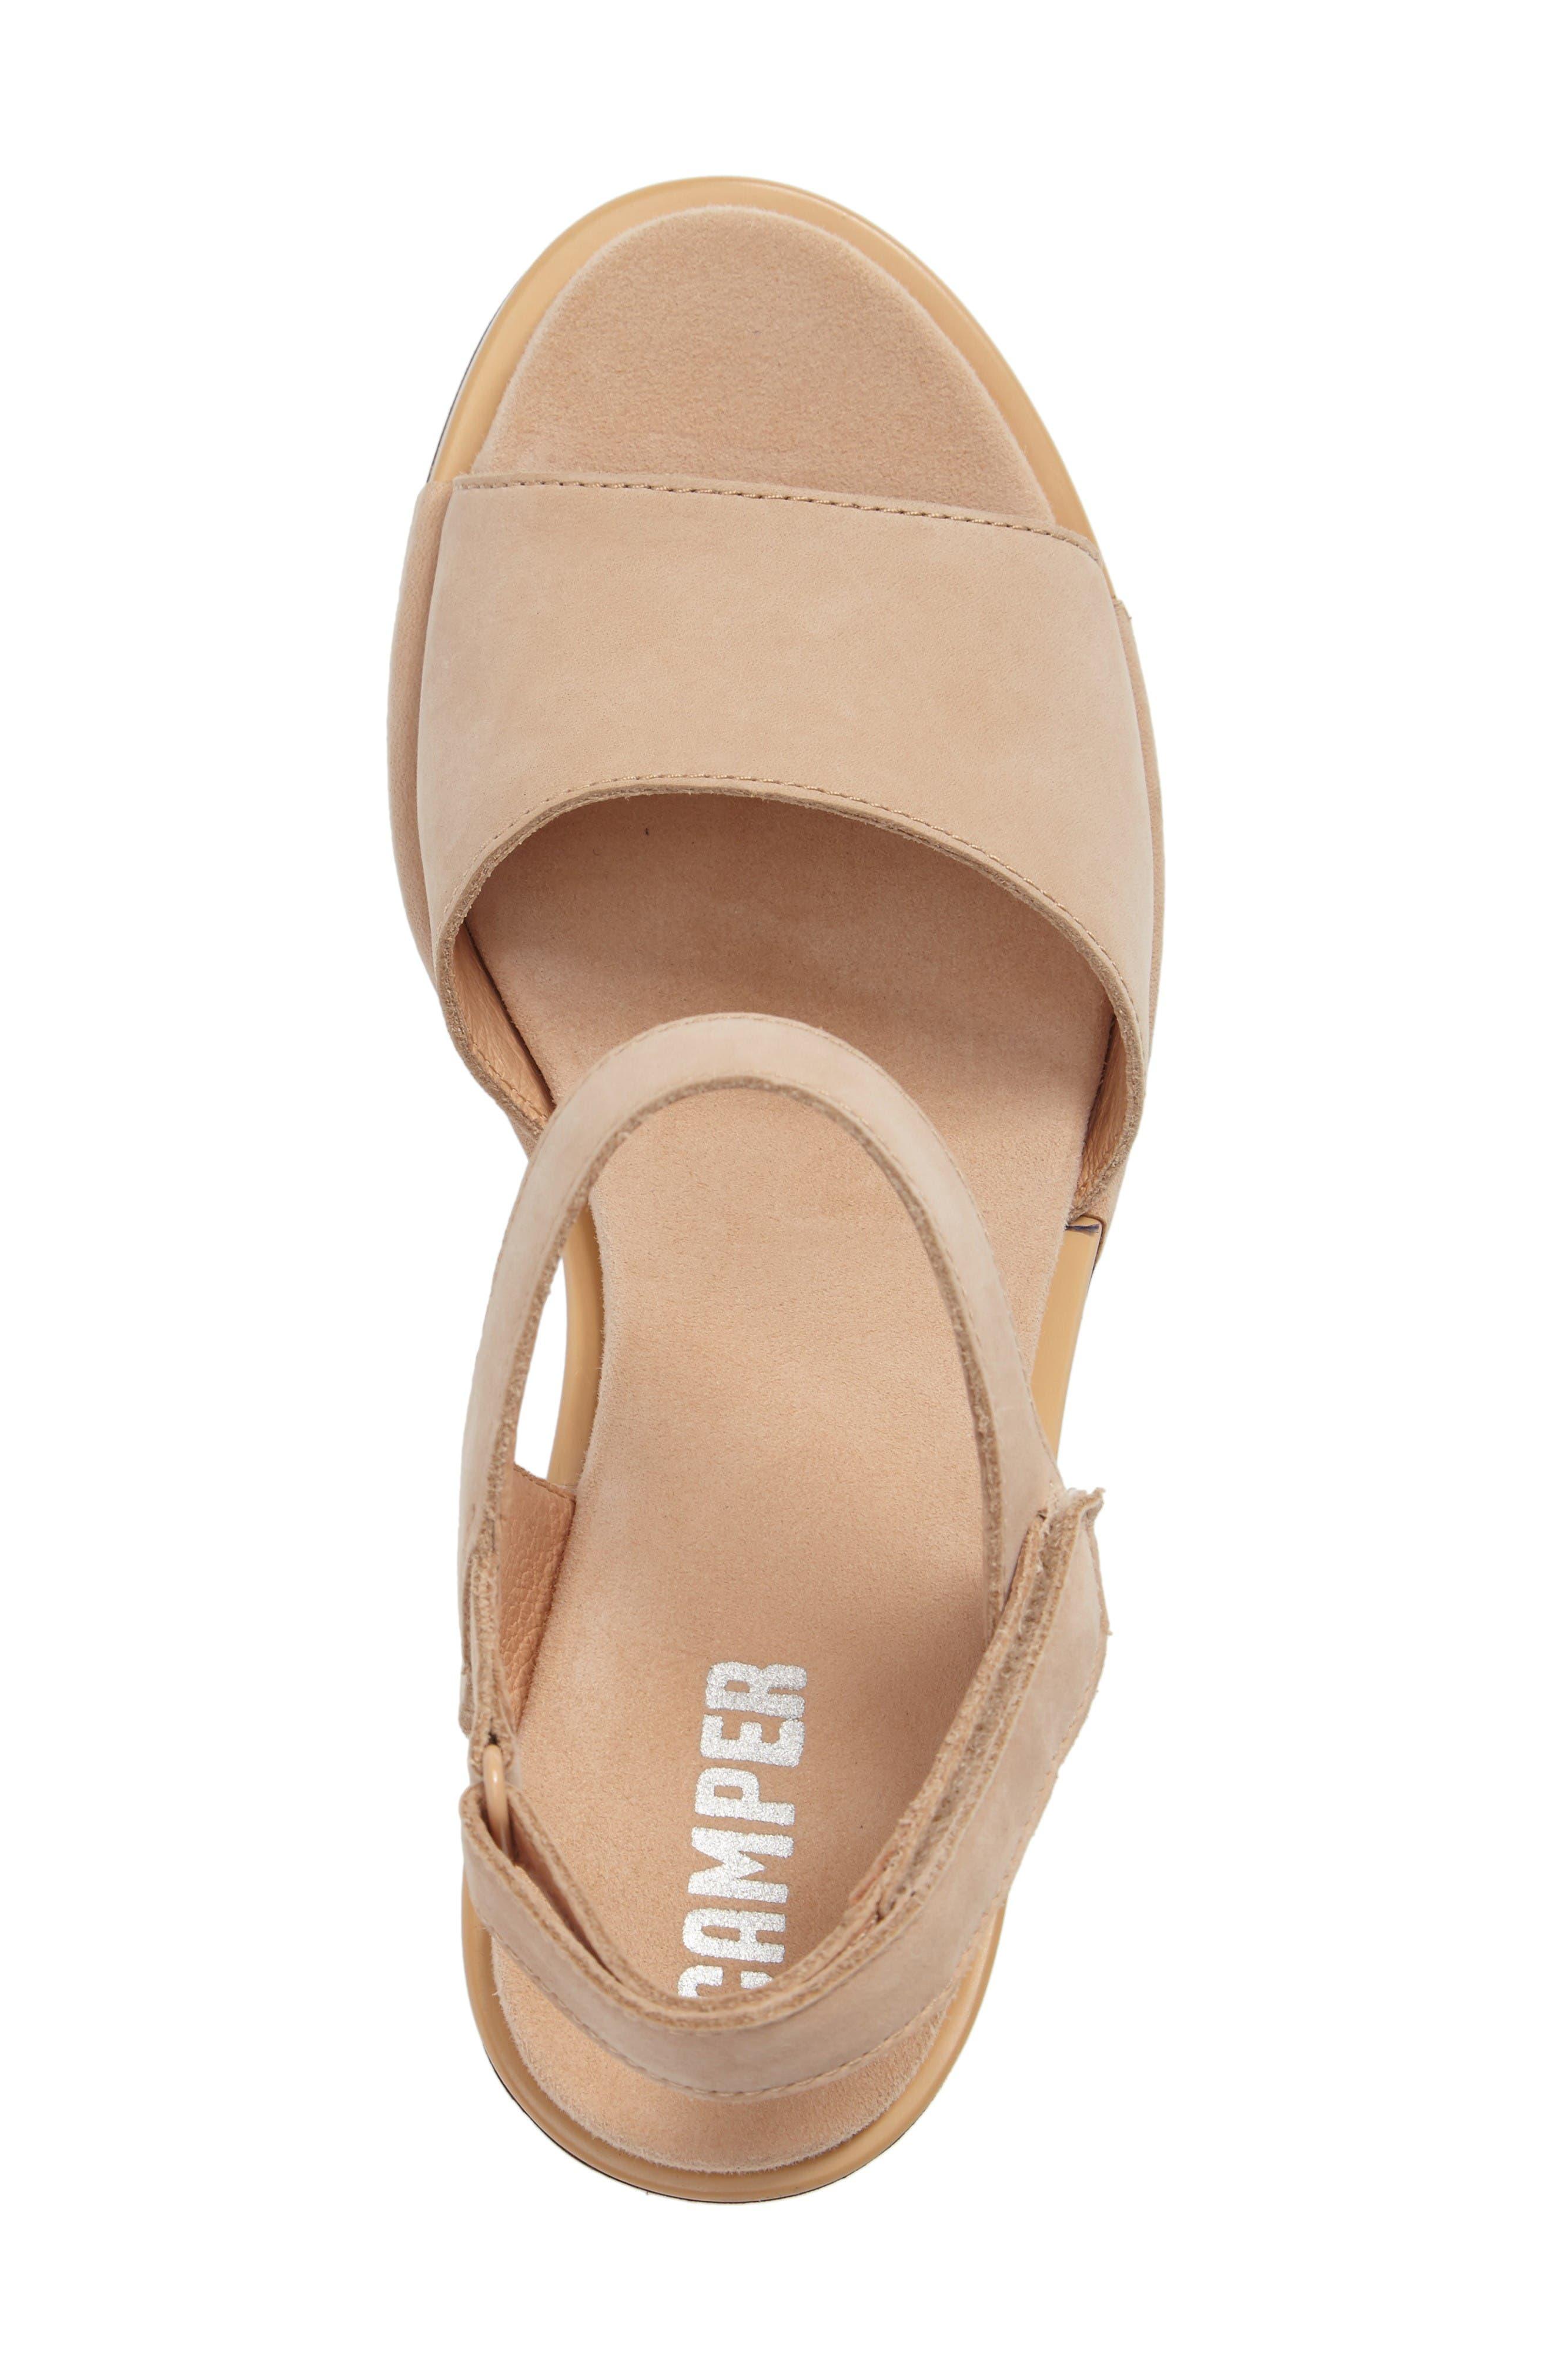 Ivy Ankle Strap Sandal,                             Alternate thumbnail 3, color,                             Beige Leather